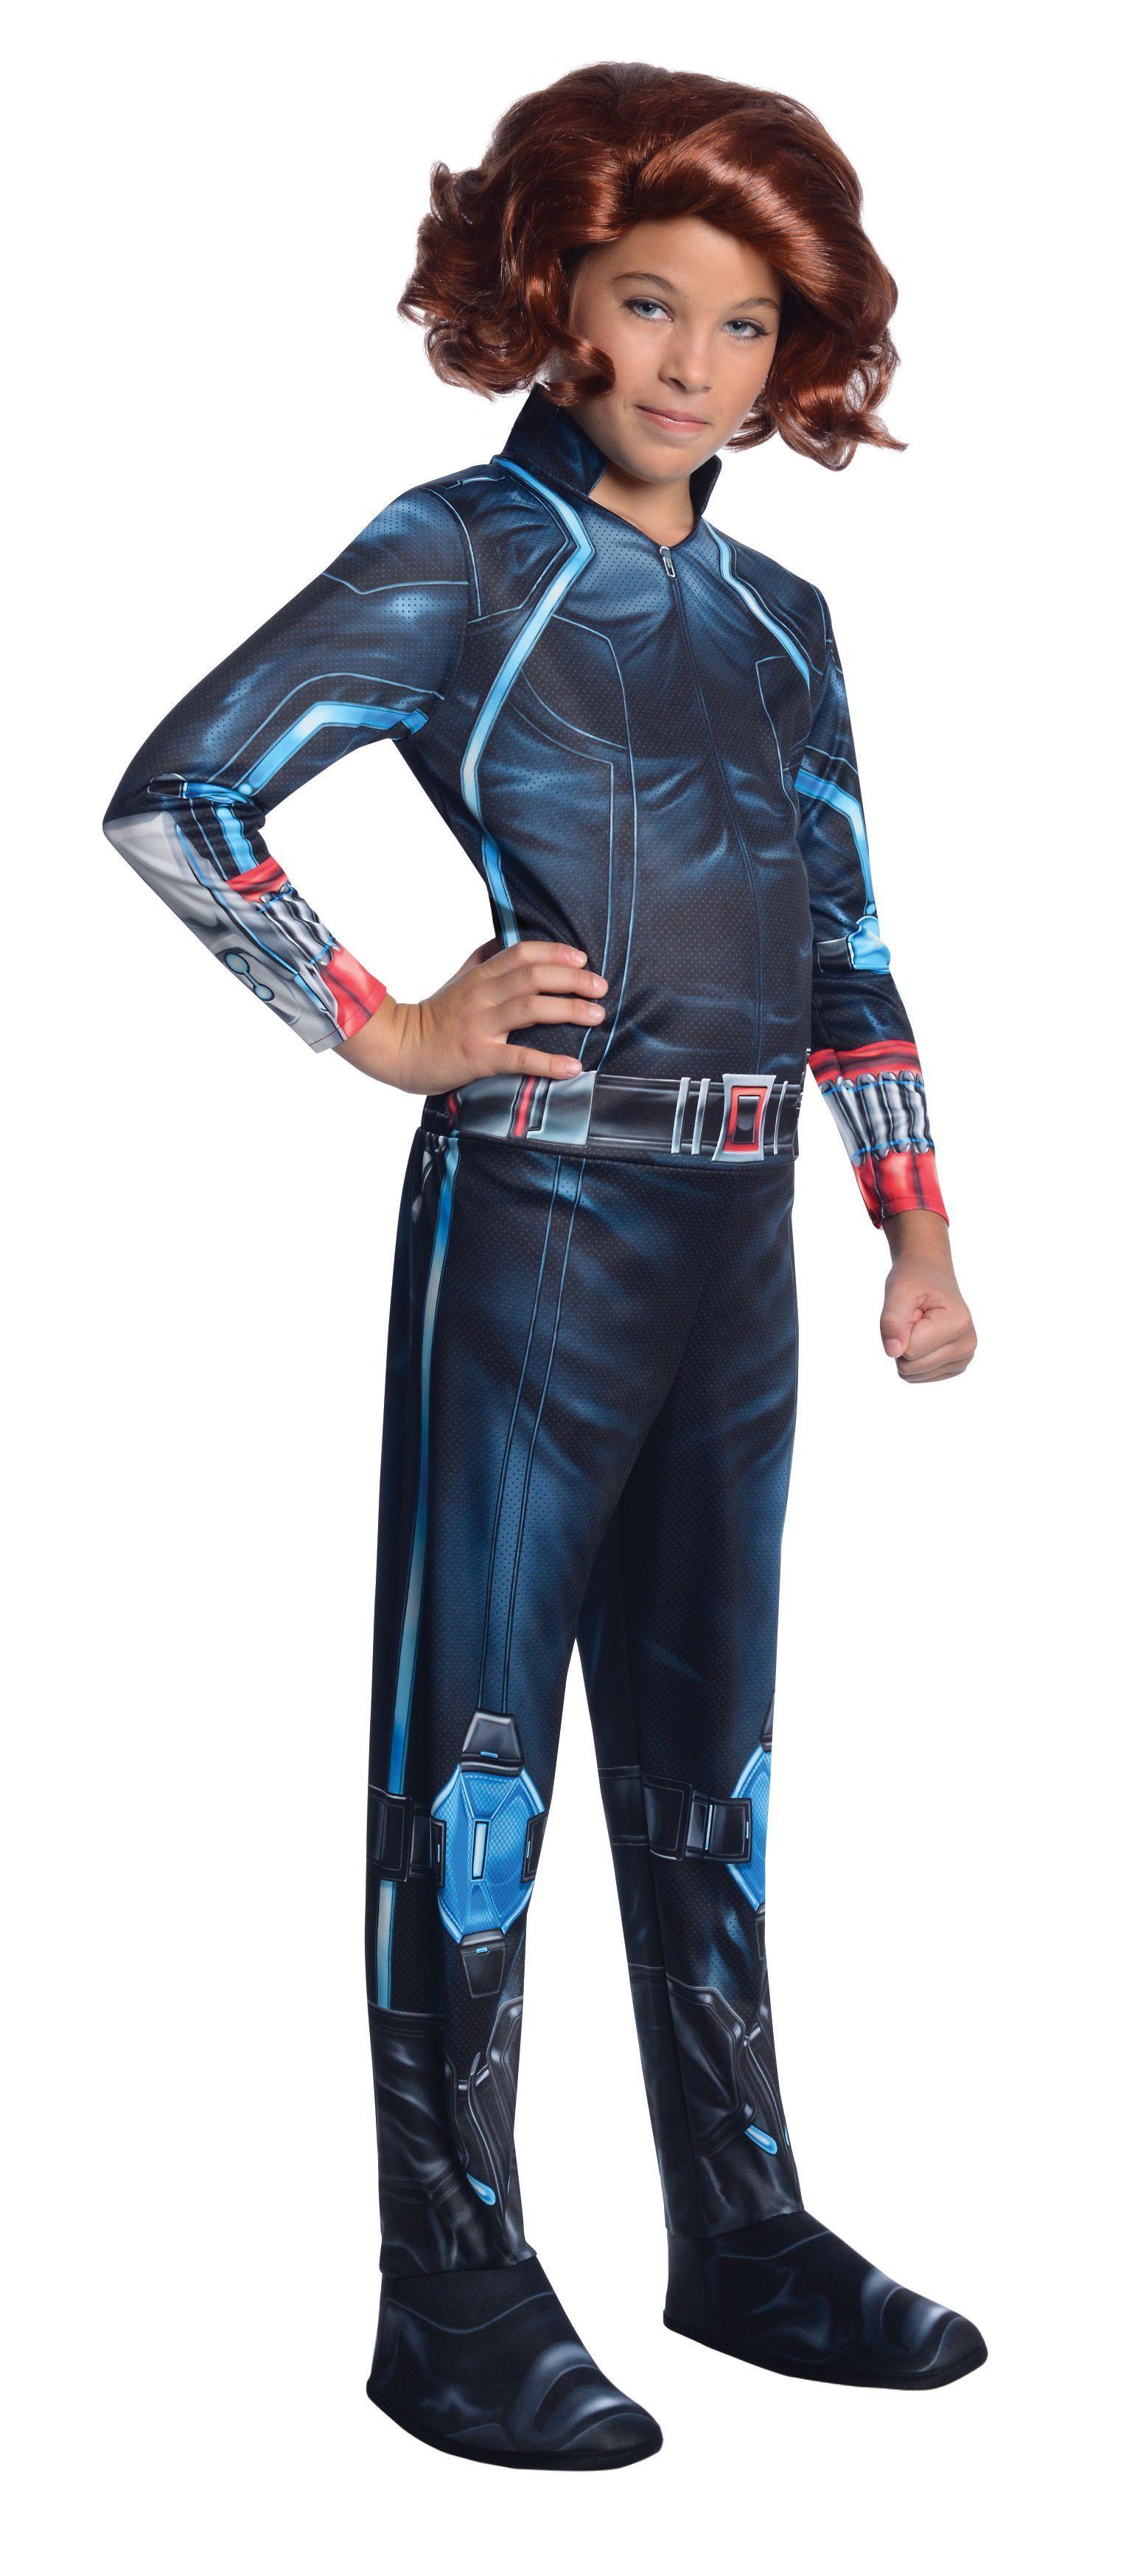 Black Widow Avengers 2 Age of Ultron Girl's Costume